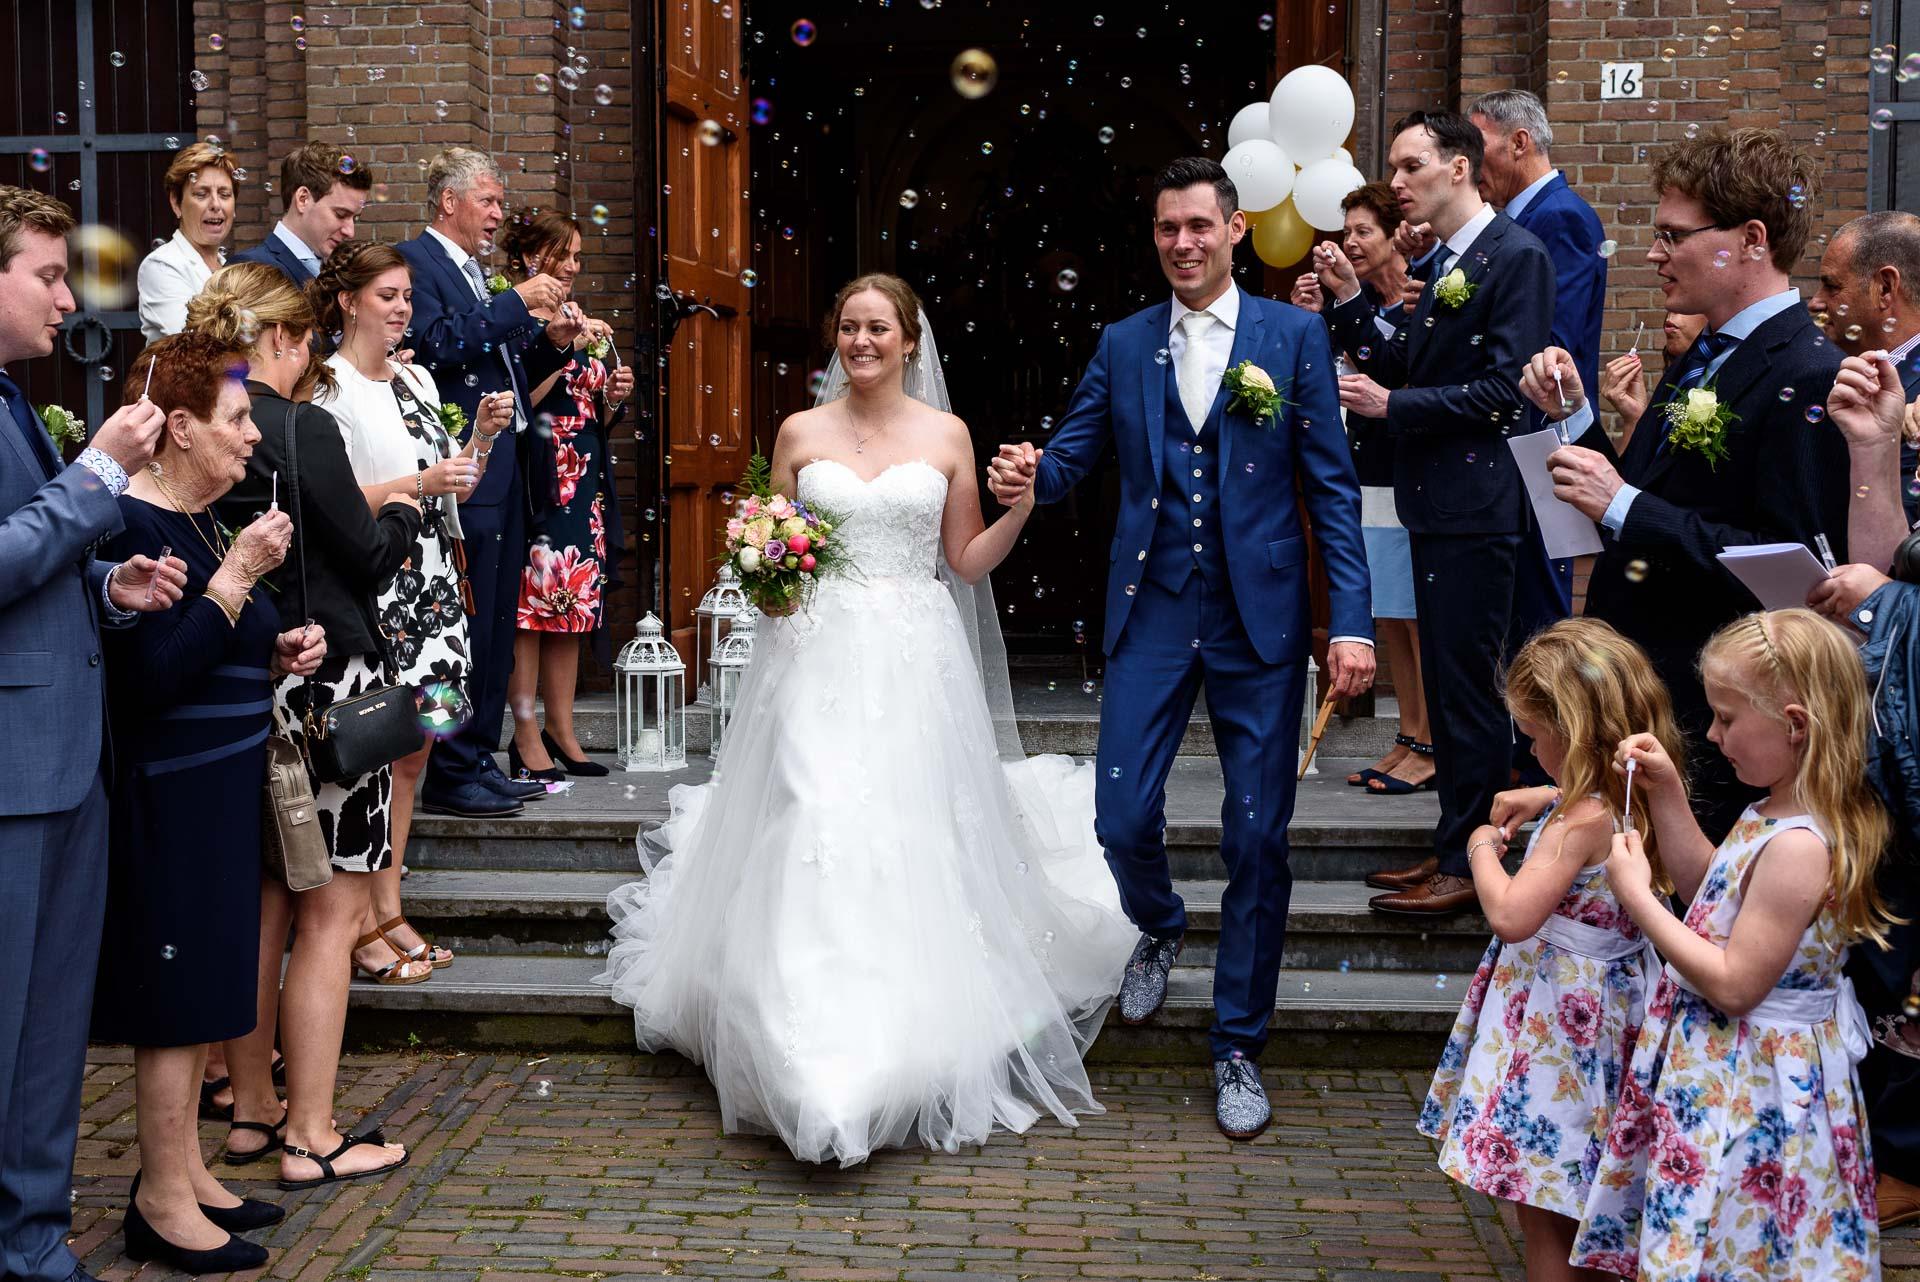 Wedding Soap Bubbles Church Exit